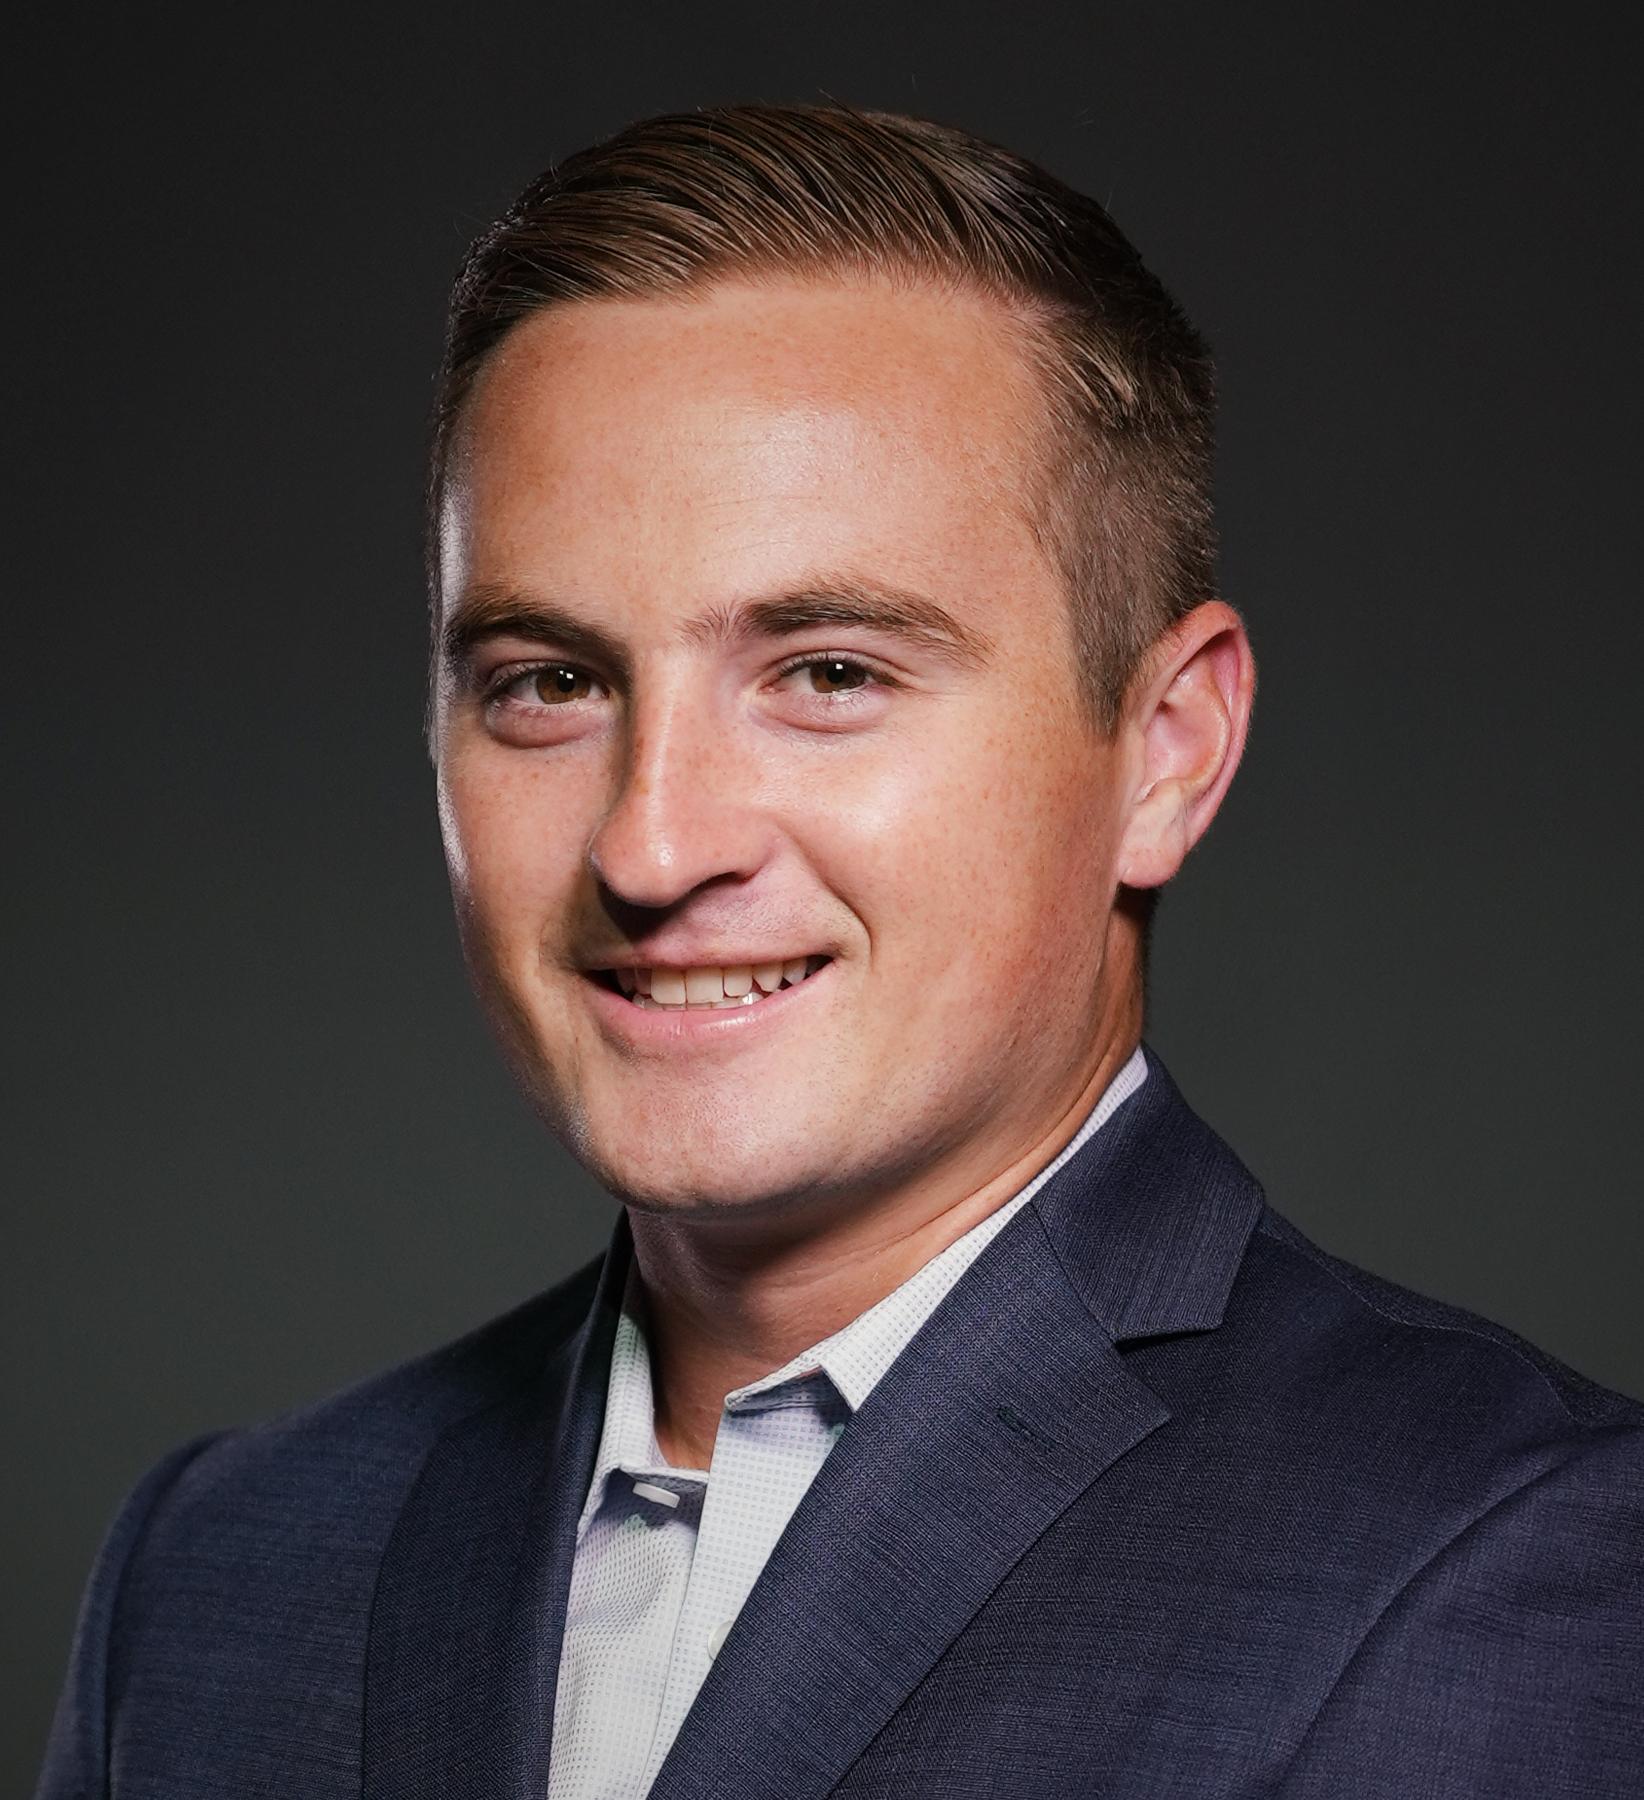 Joe Hoey Headshot | Dakota Investments